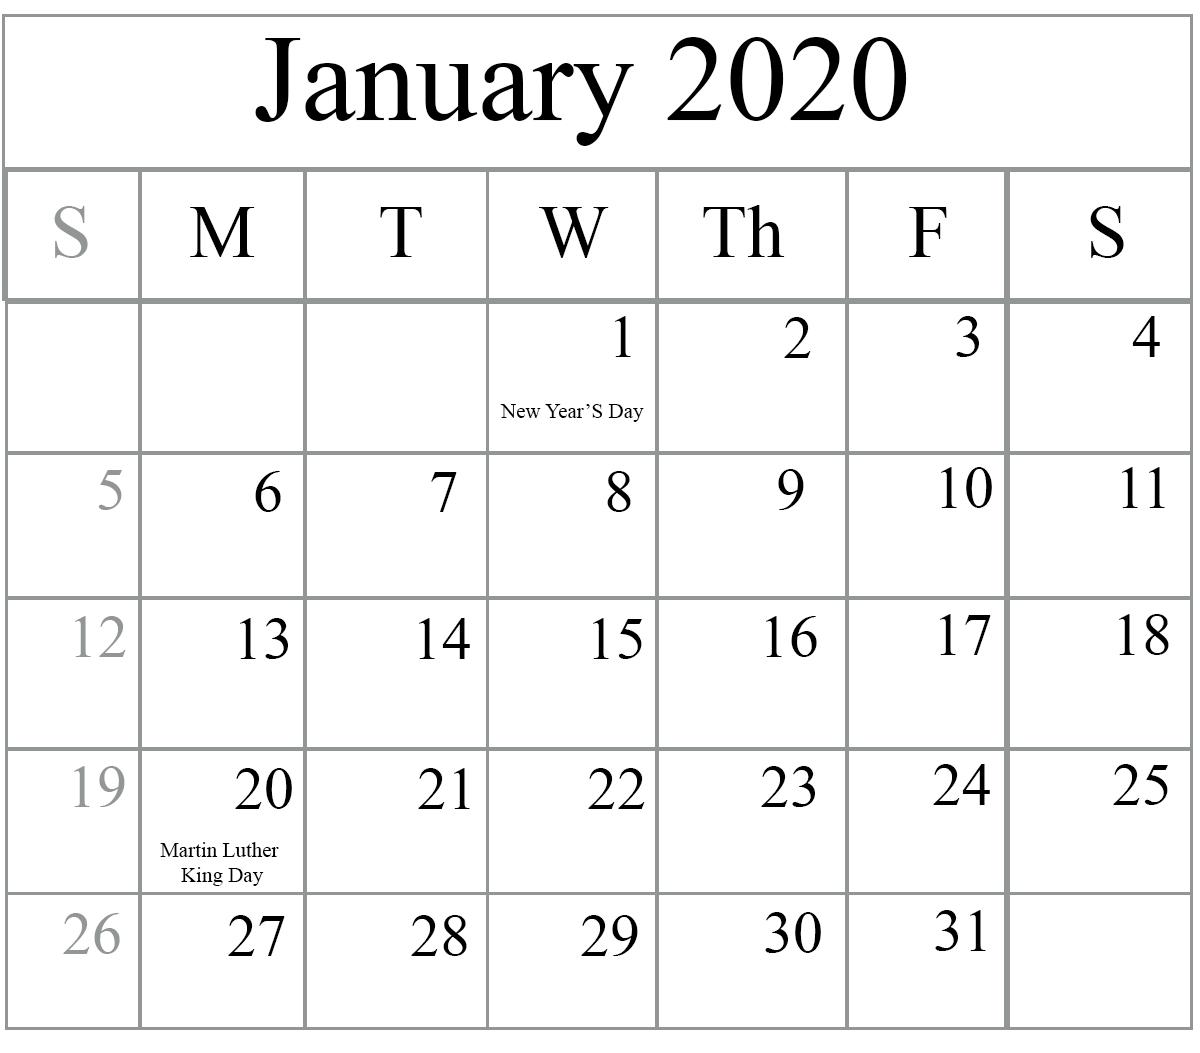 Free Blank January 2020 Calendar Printable In Pdf, Word, Excel Calendars You Can Edit